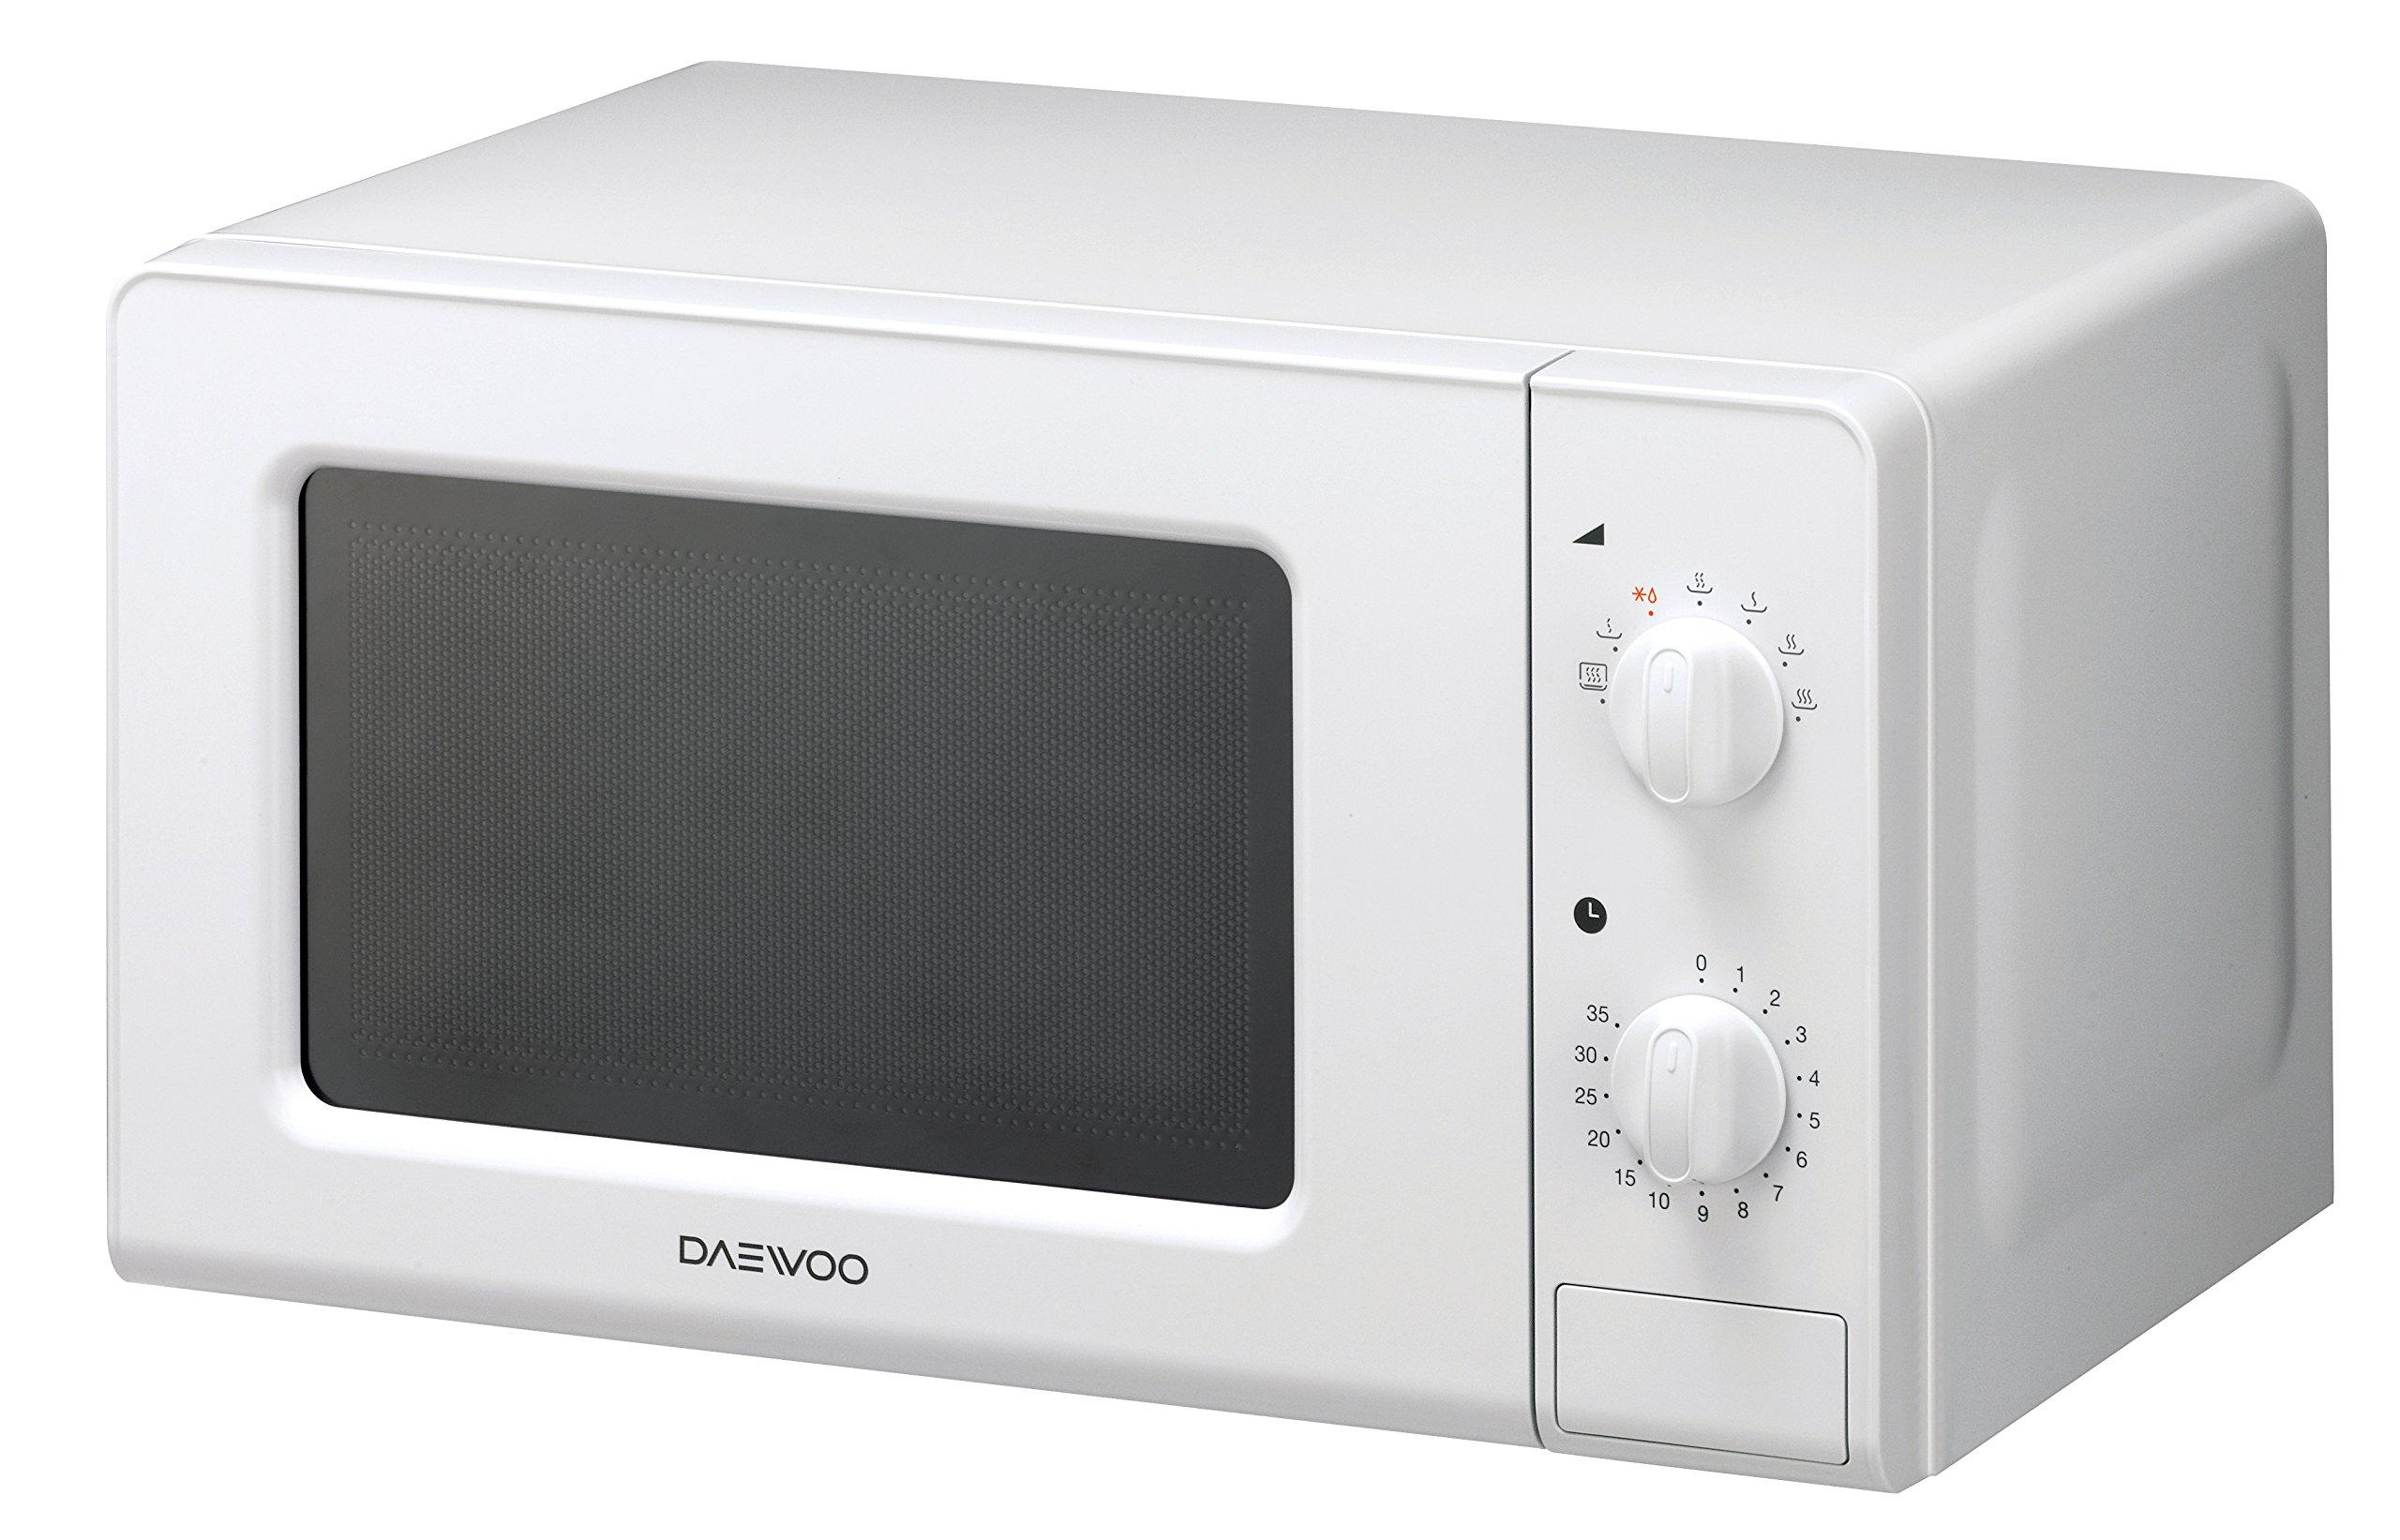 Daewoo Kor 6f07 Four Micro Ondes Manuel Sans Grill Blanc 20